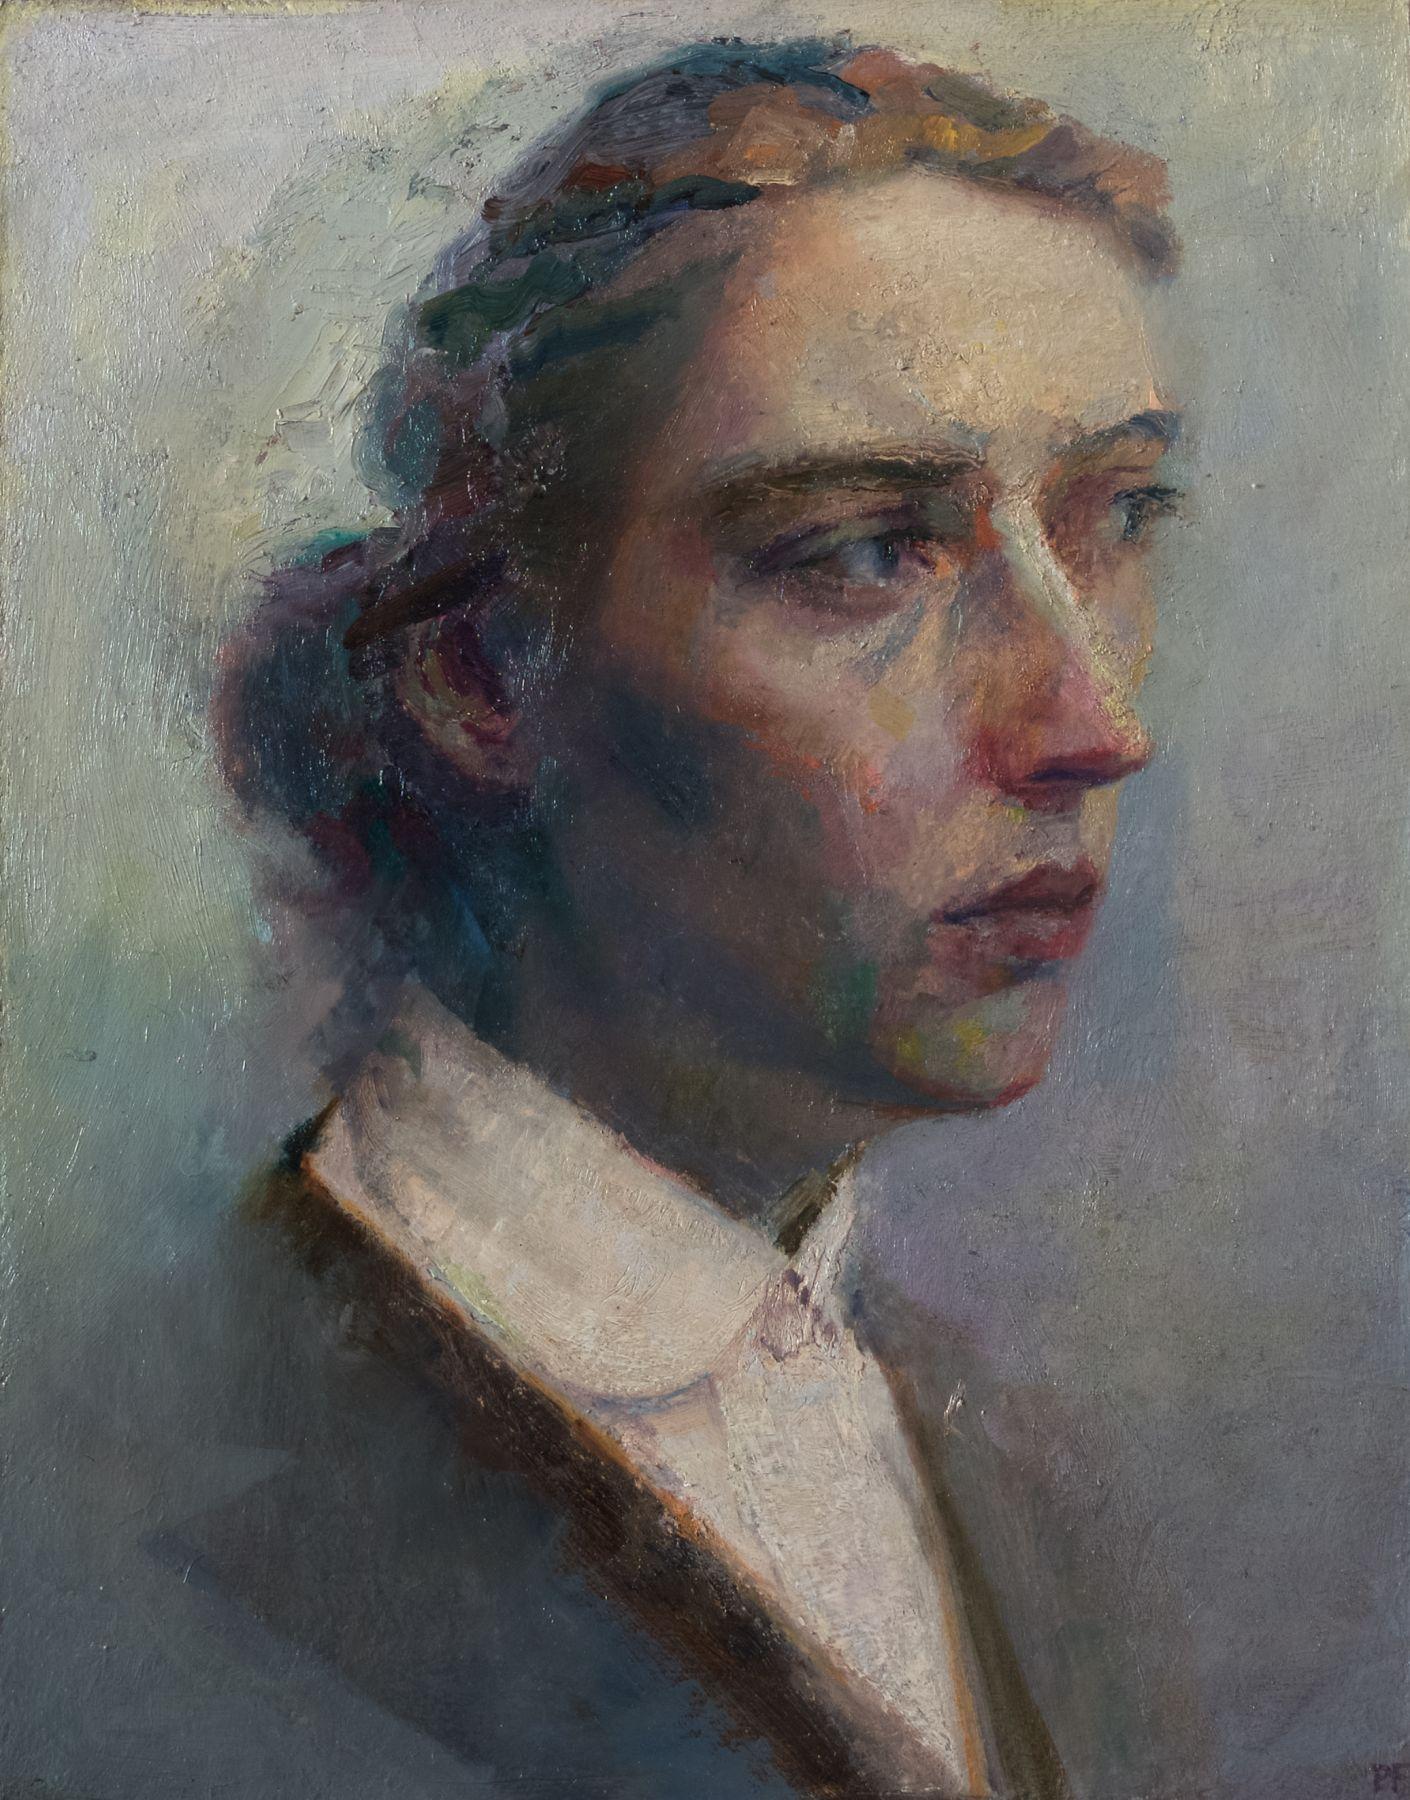 paul fenniak, Portrait of Michèle, 2018, oil on wood, 14 x 11 inches